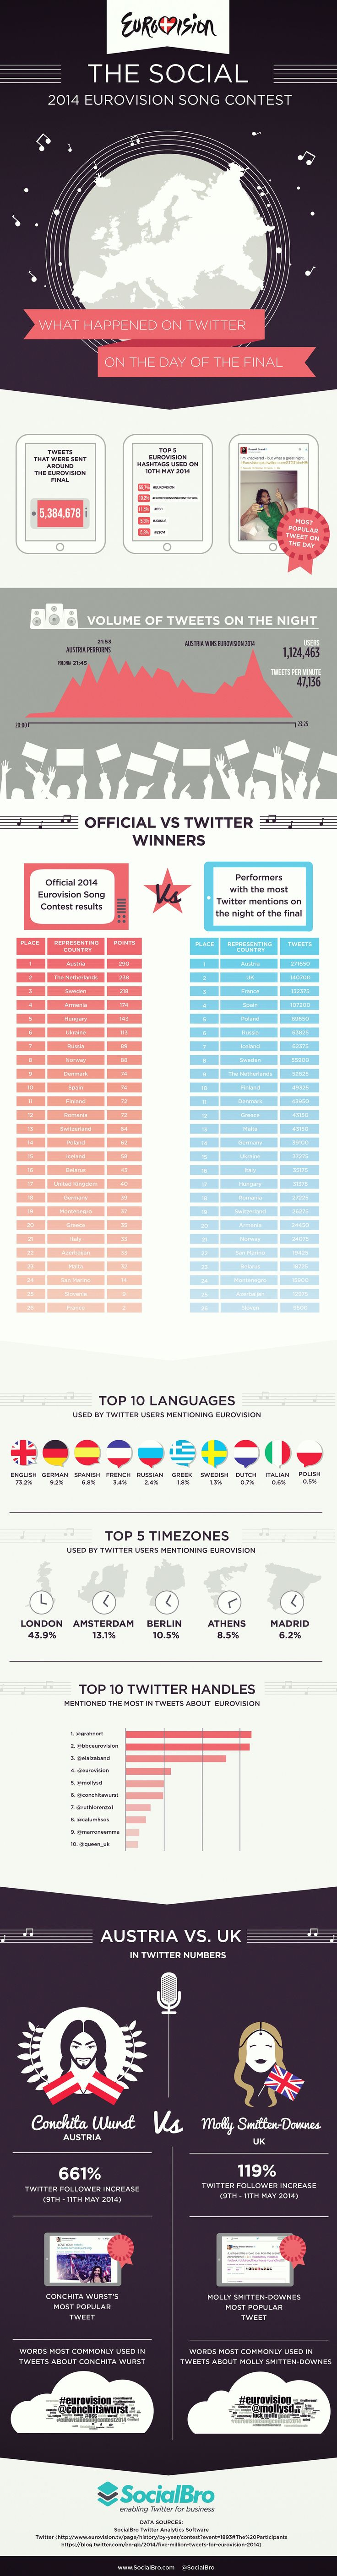 De infographic die je wist dat komen ging #esf14 | Twittermania